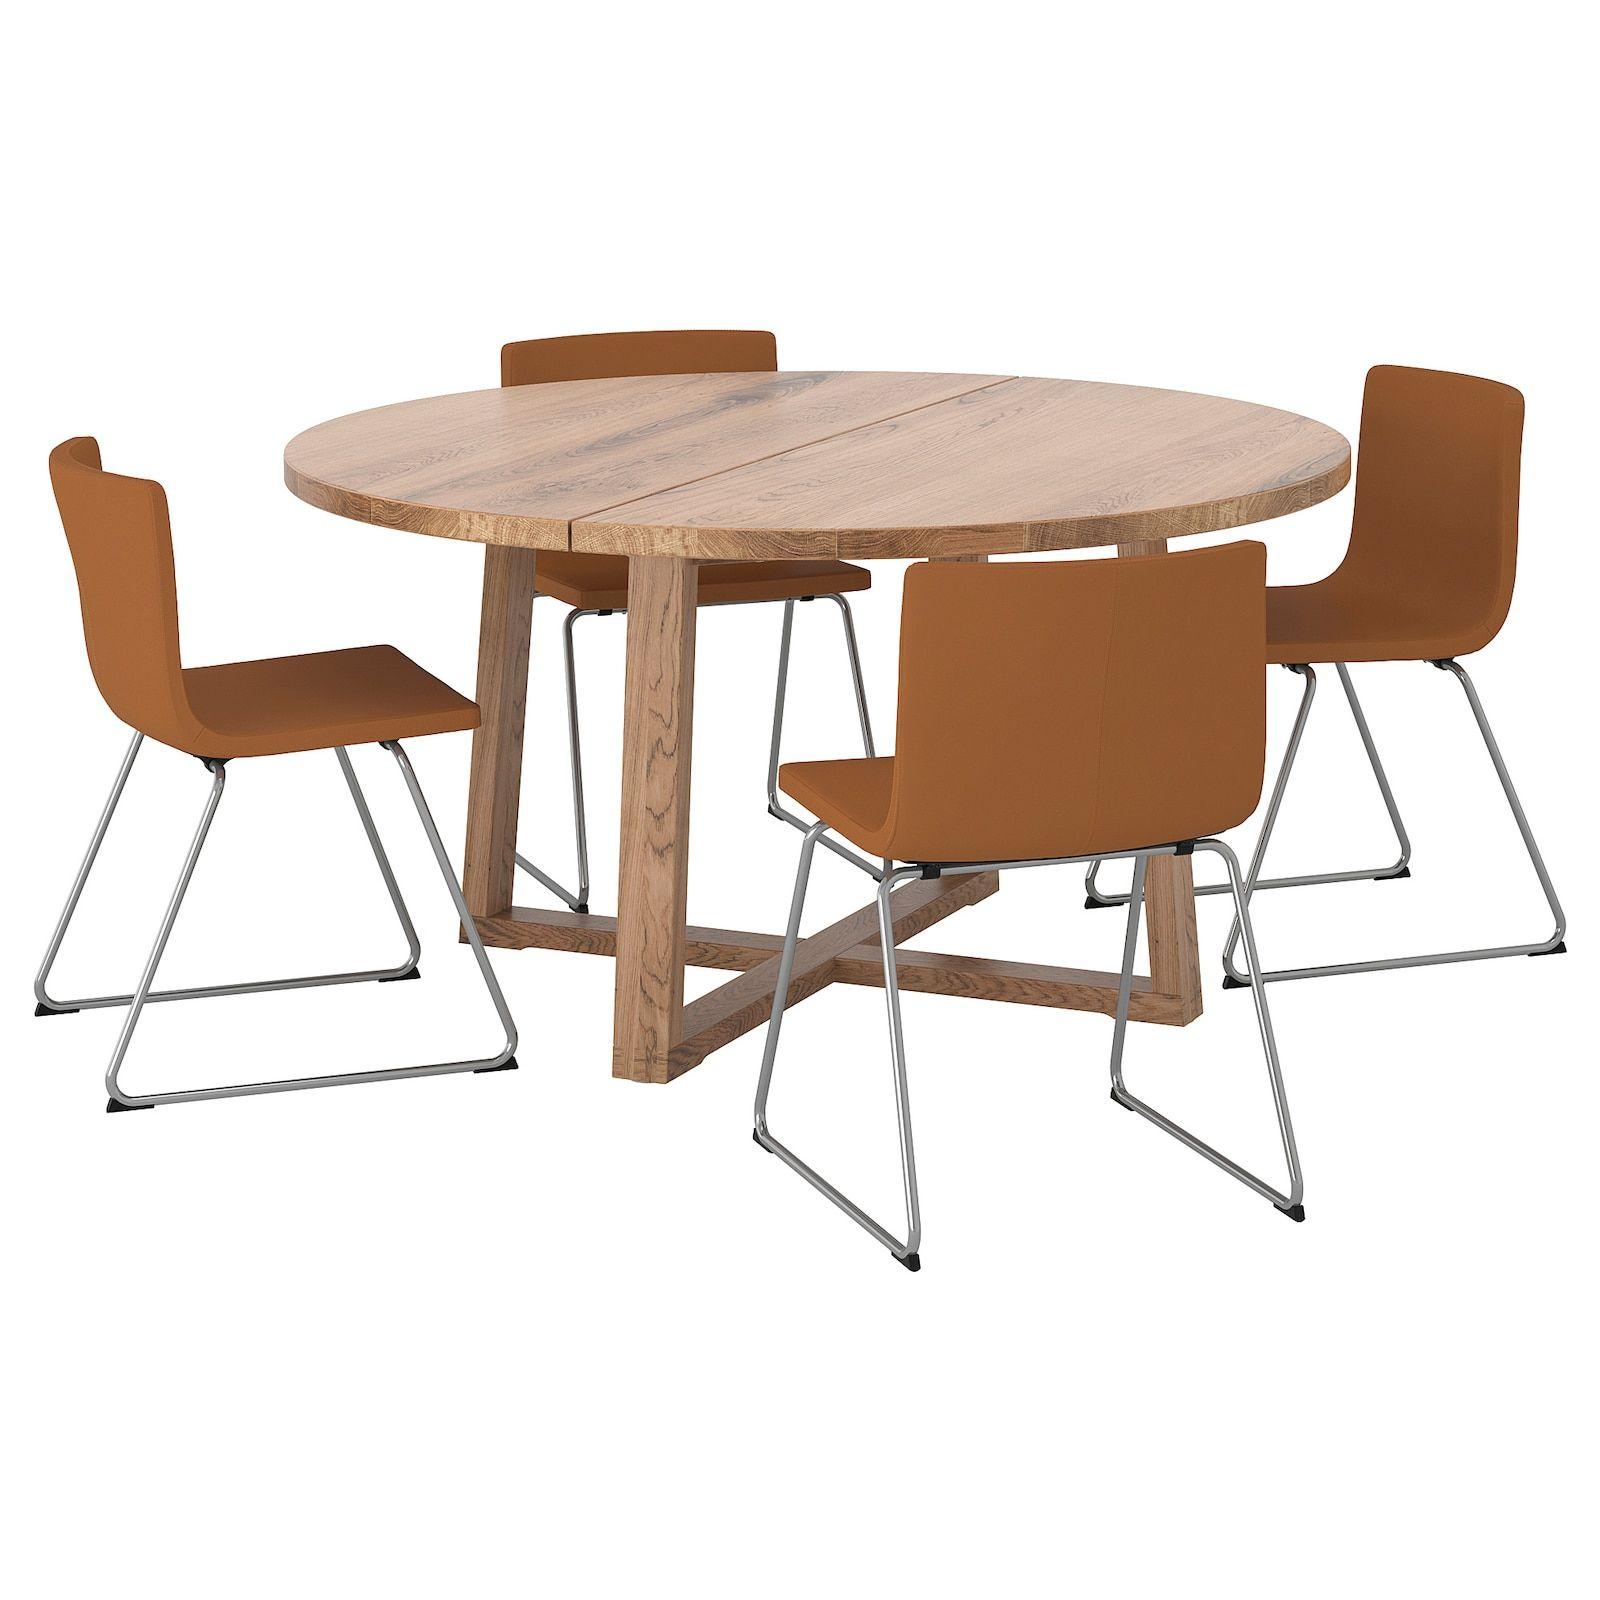 Morbylanga Bernhard Table And 4 Chairs Oak Veneer Brown Stained Mjuk Golden Brown Ikea In 2020 Ikea Table Furnishings [ 1600 x 1600 Pixel ]